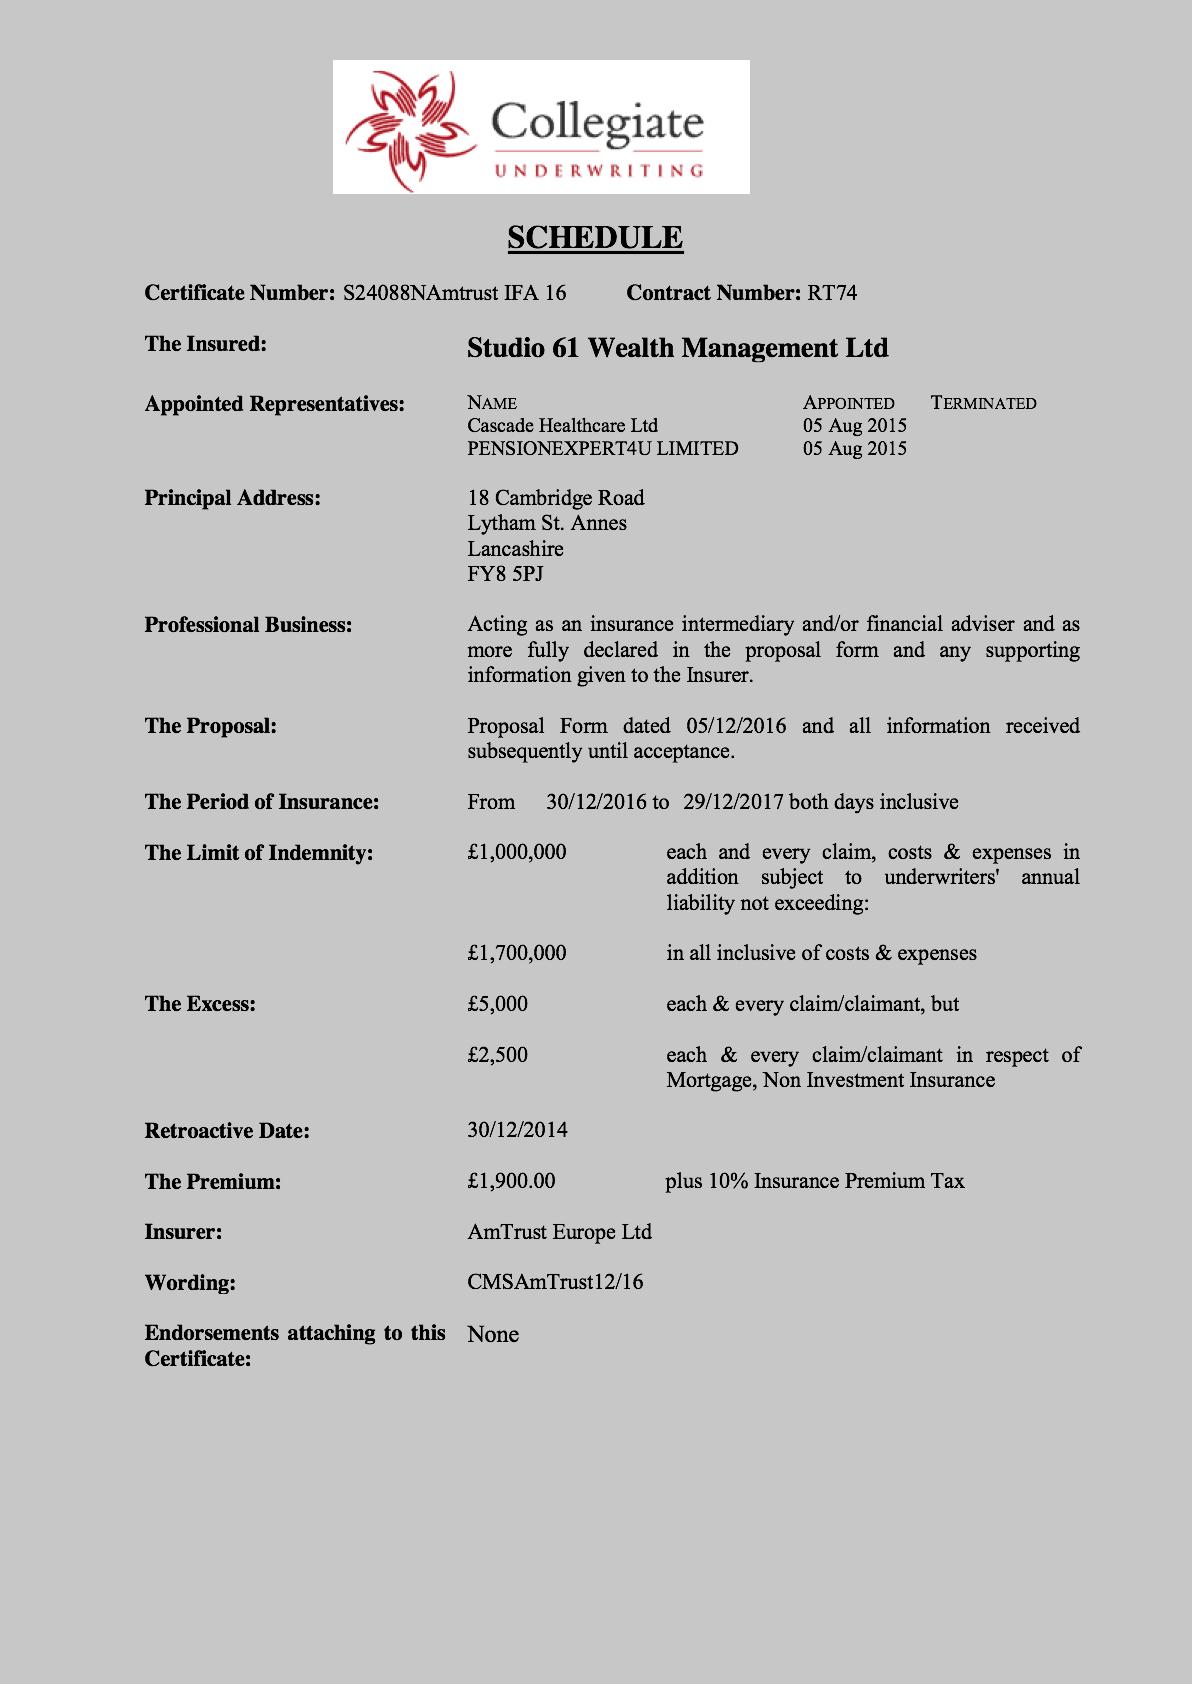 Pi Certificate 2017 Studio 61 Wealth Management